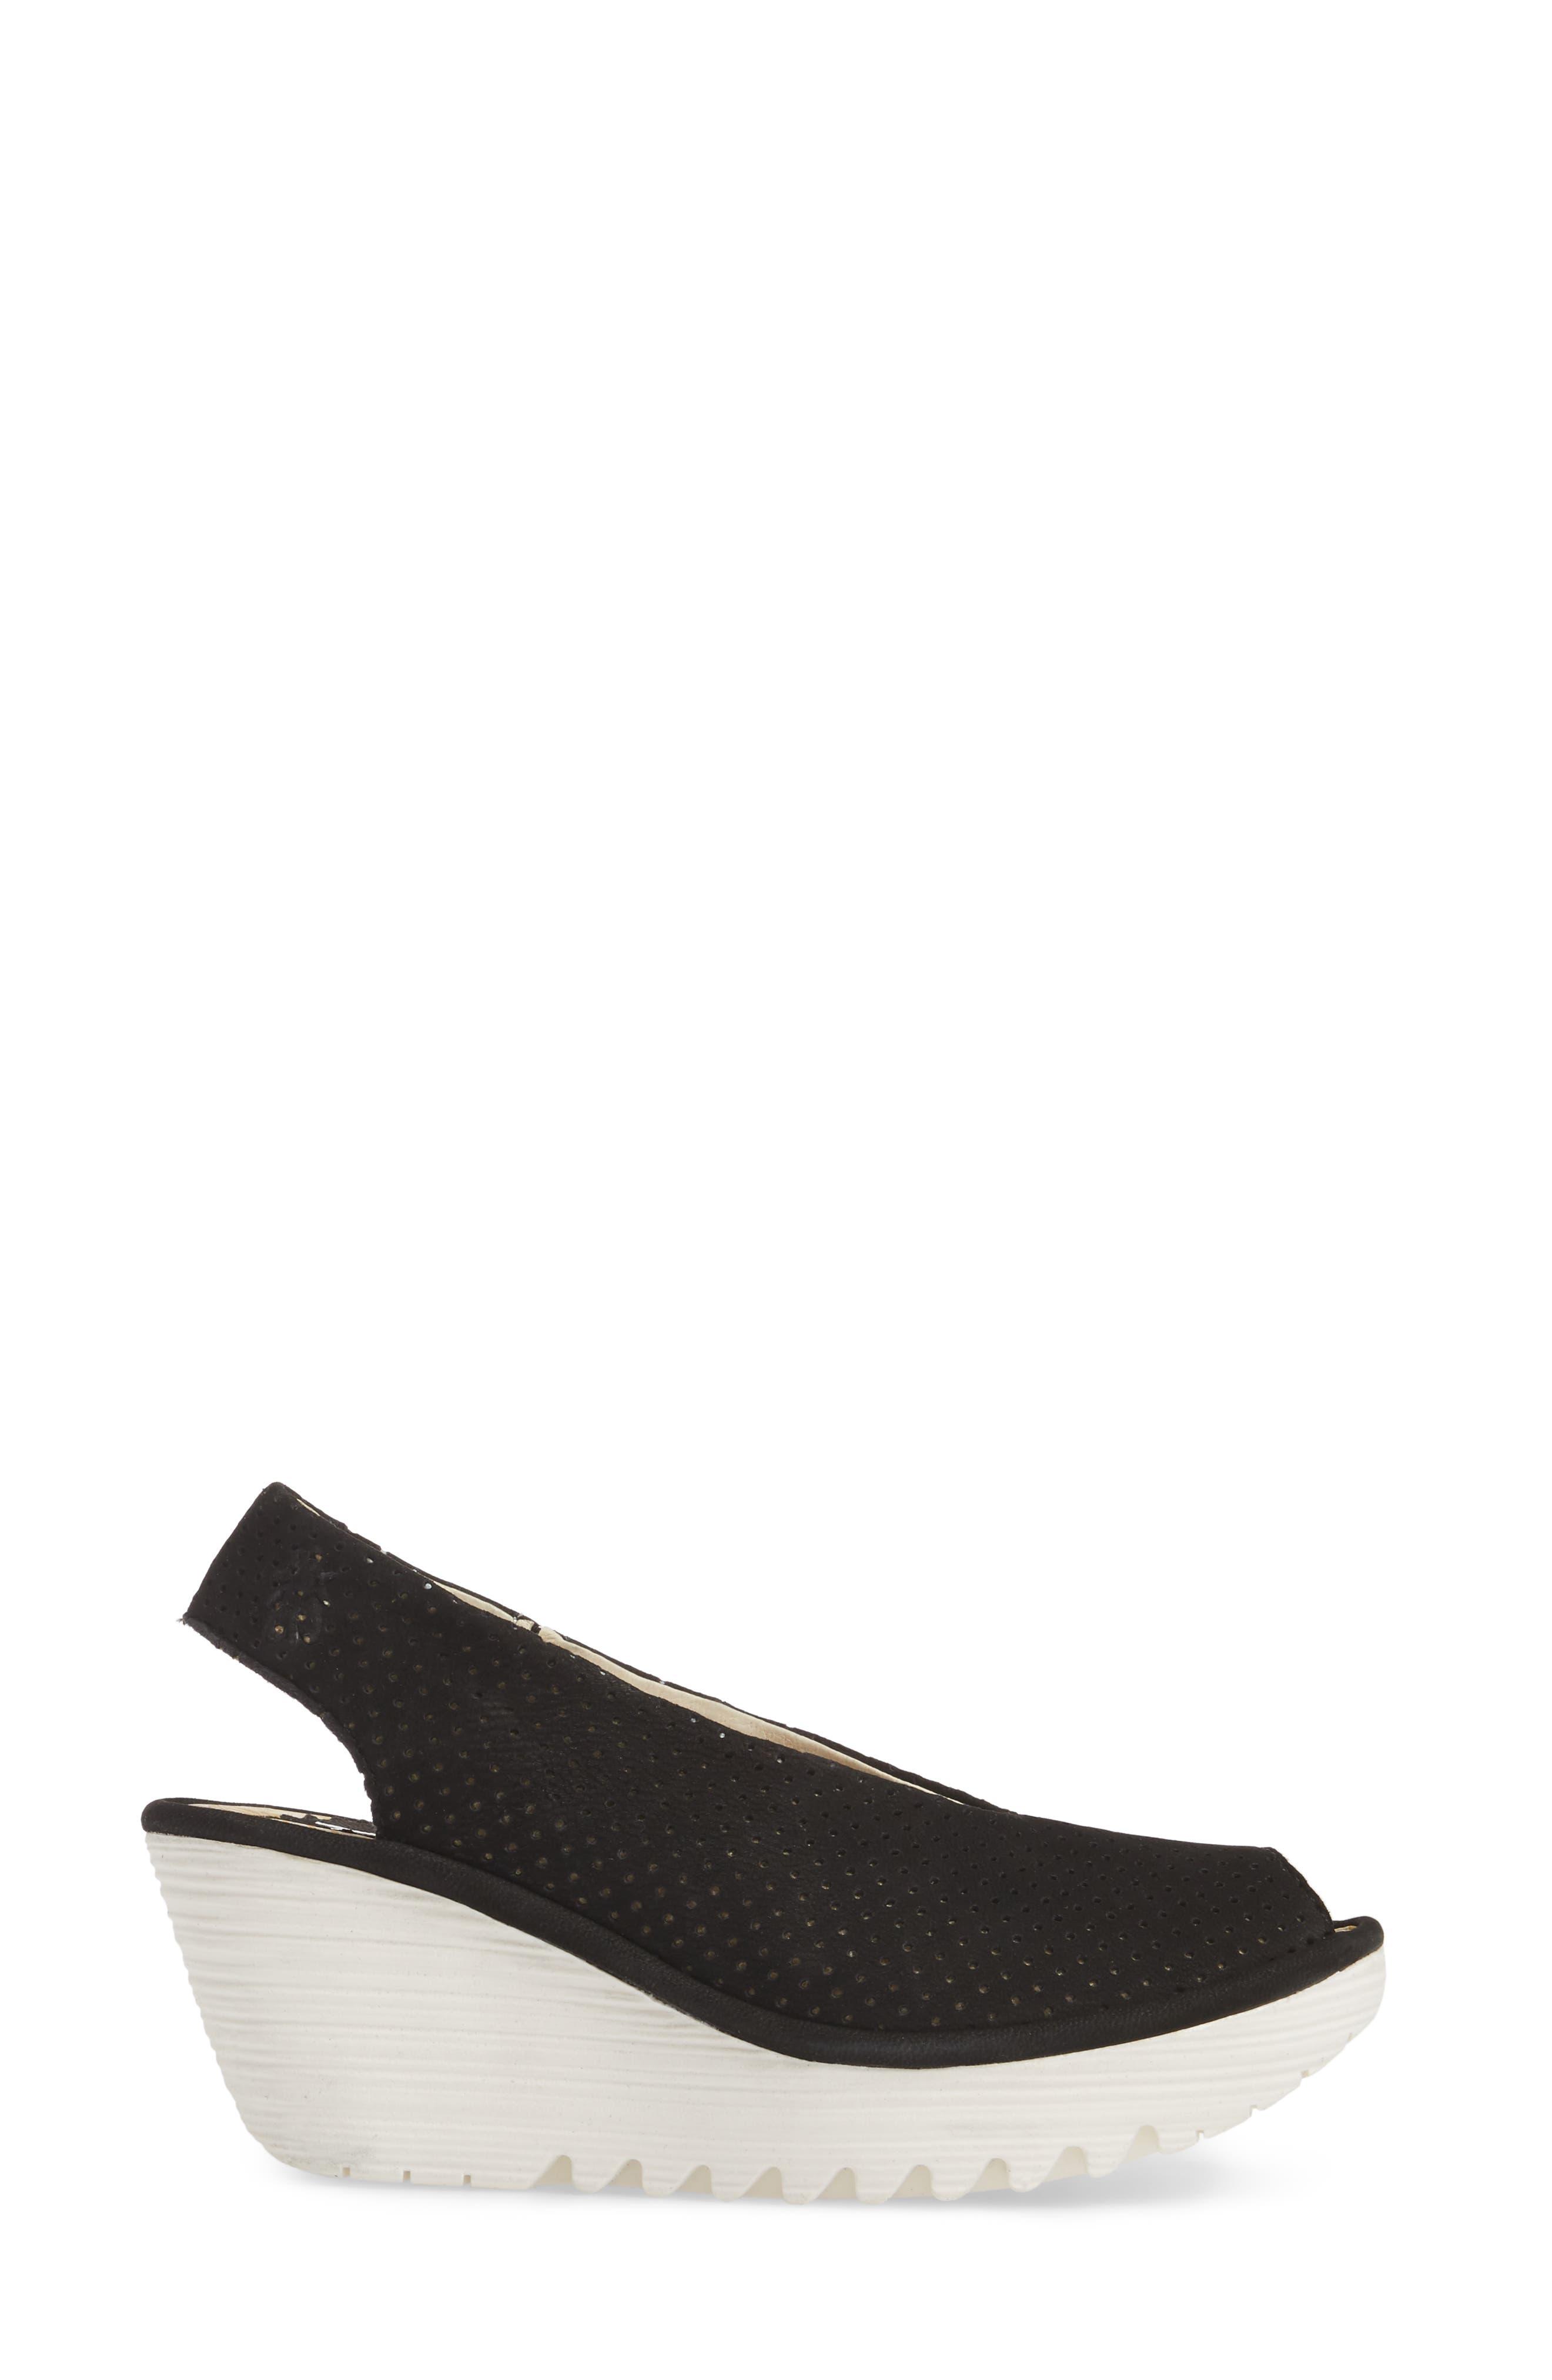 Yazu Wedge Sandal,                             Alternate thumbnail 3, color,                             BLACK/ BLACK LEATHER